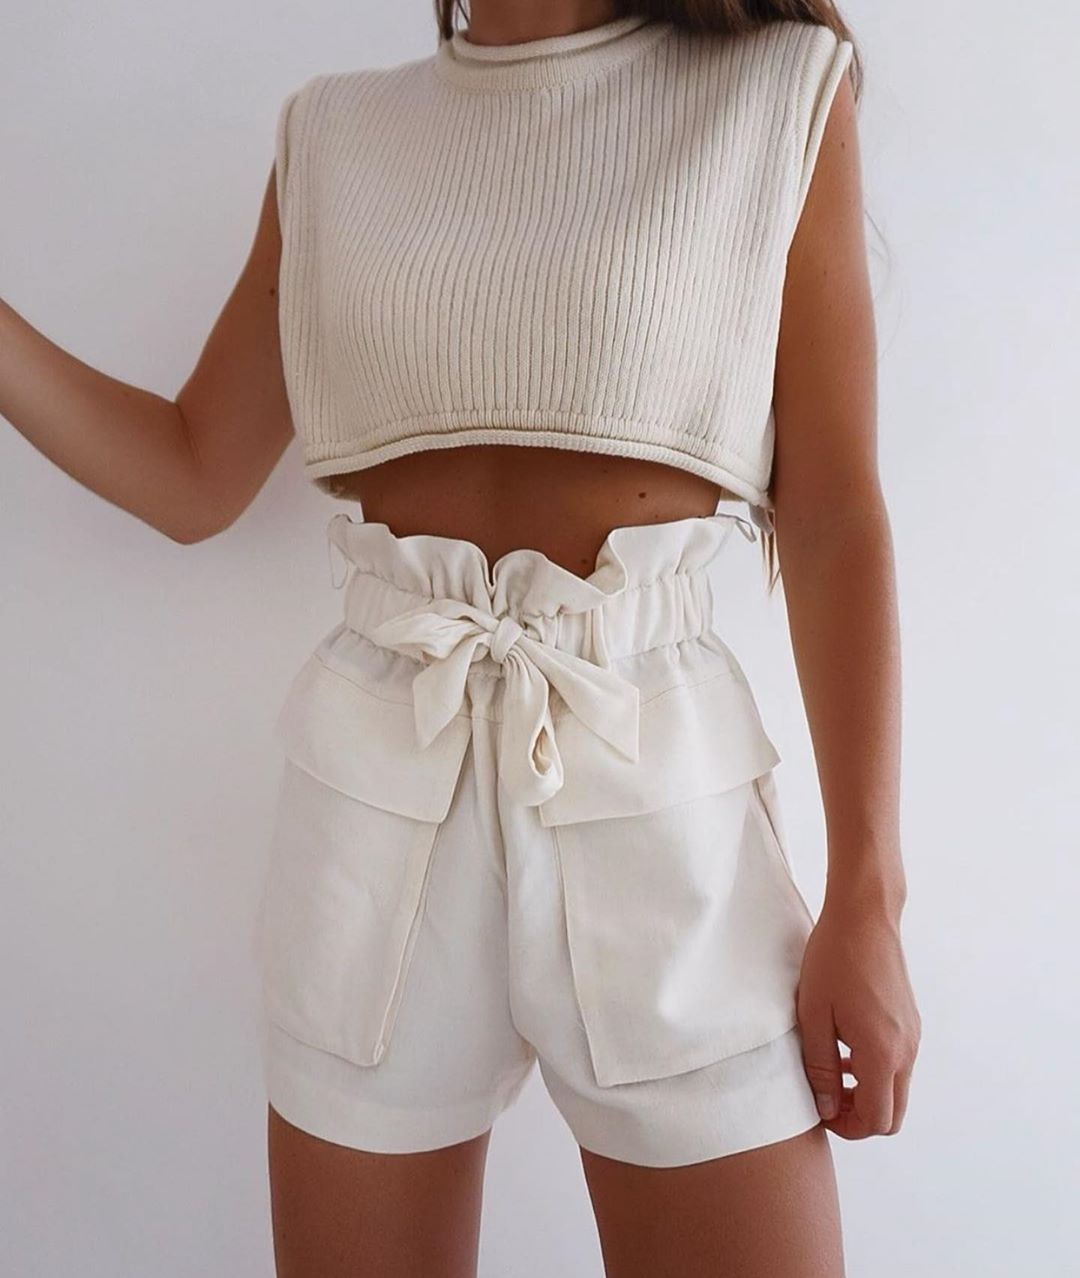 cropped knit top de Zara sur zaraaddiction